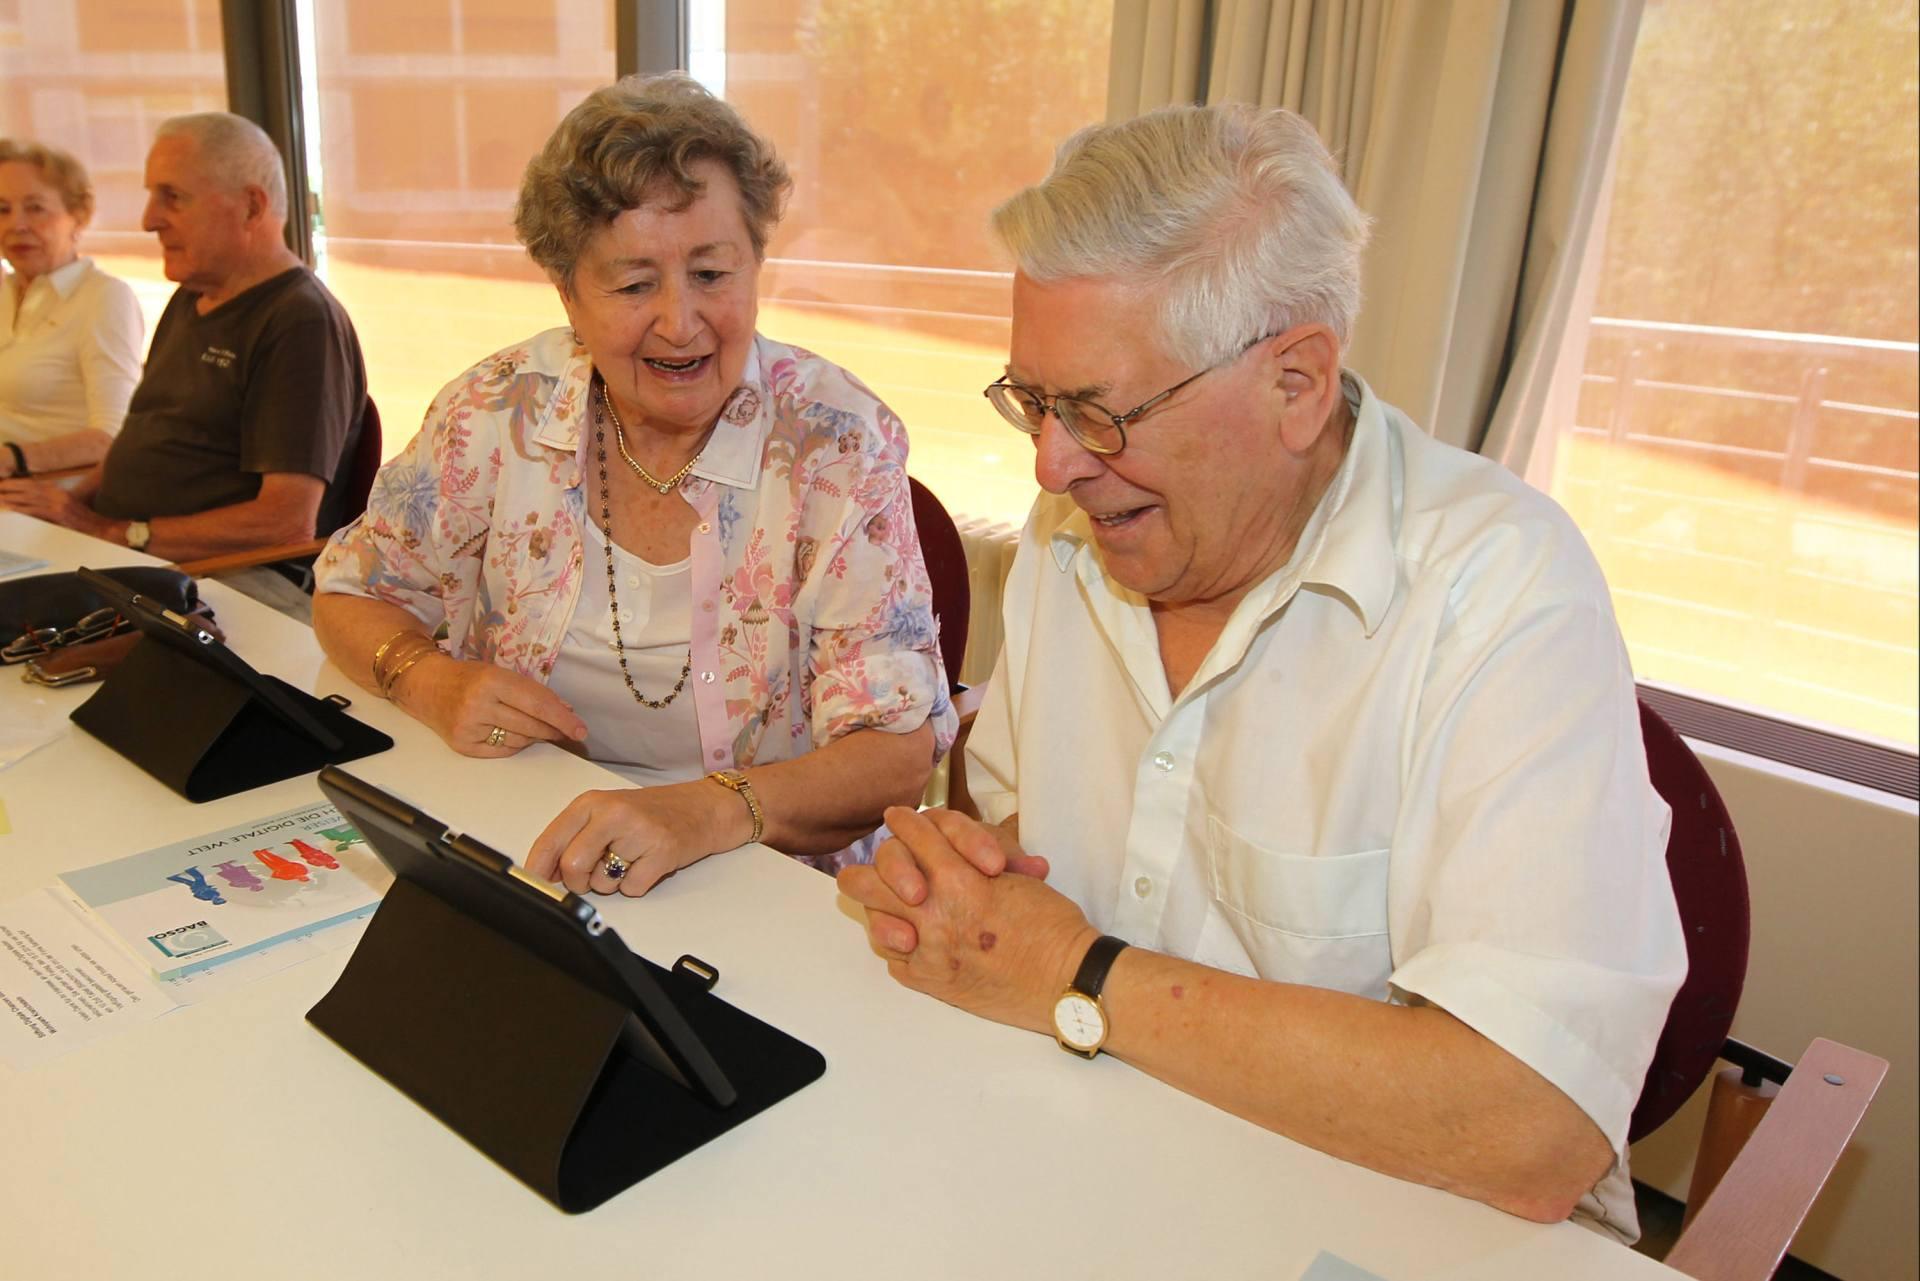 BASE Taps fuer Senioren